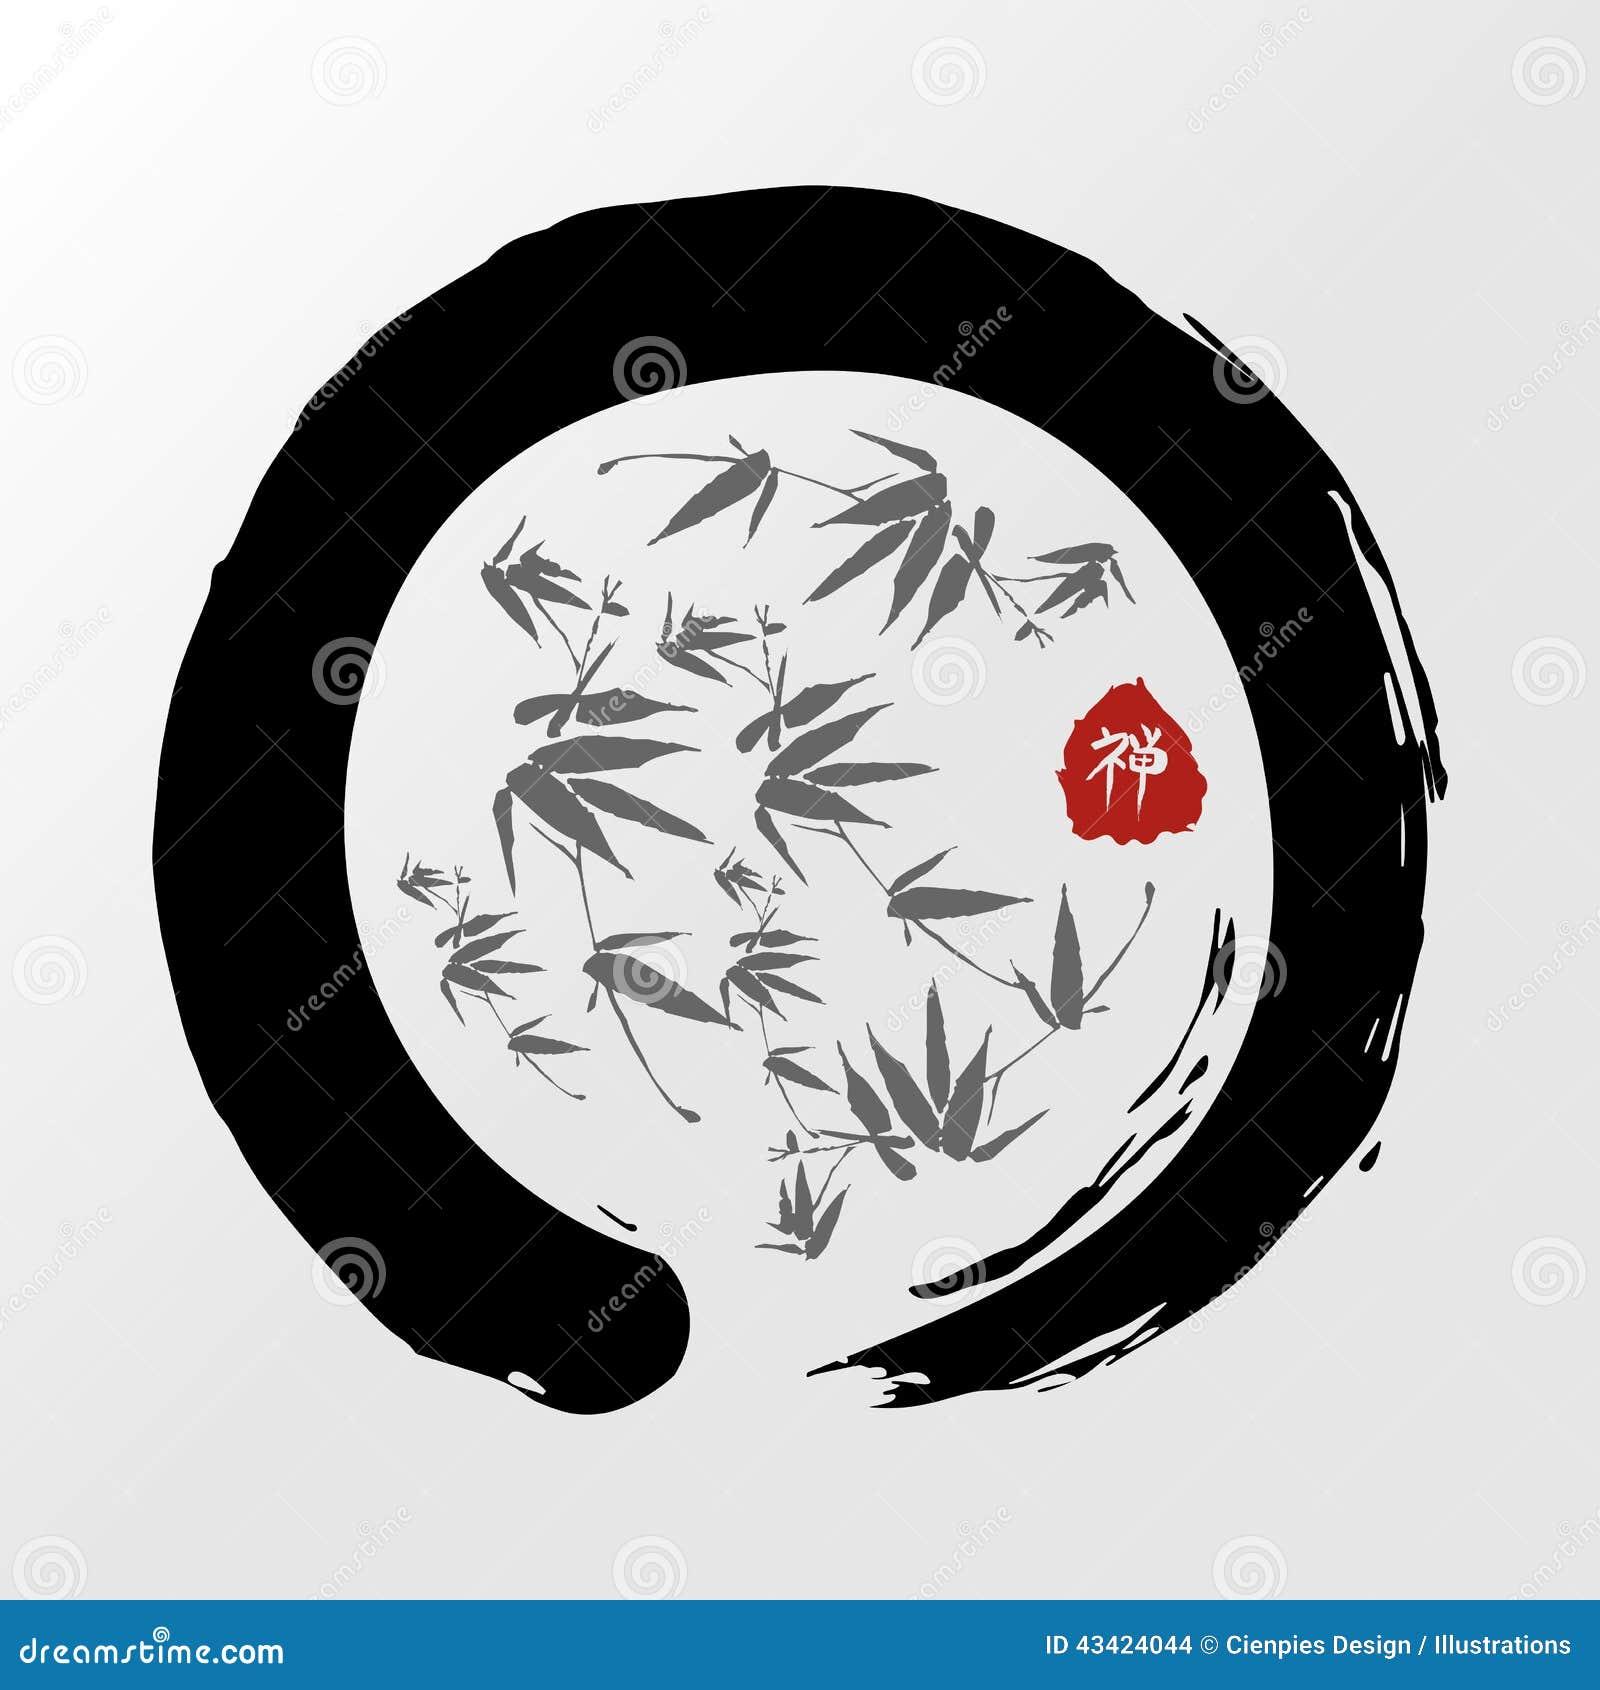 Zen Circle Illustration Stock Vector Illustration Of Illustration